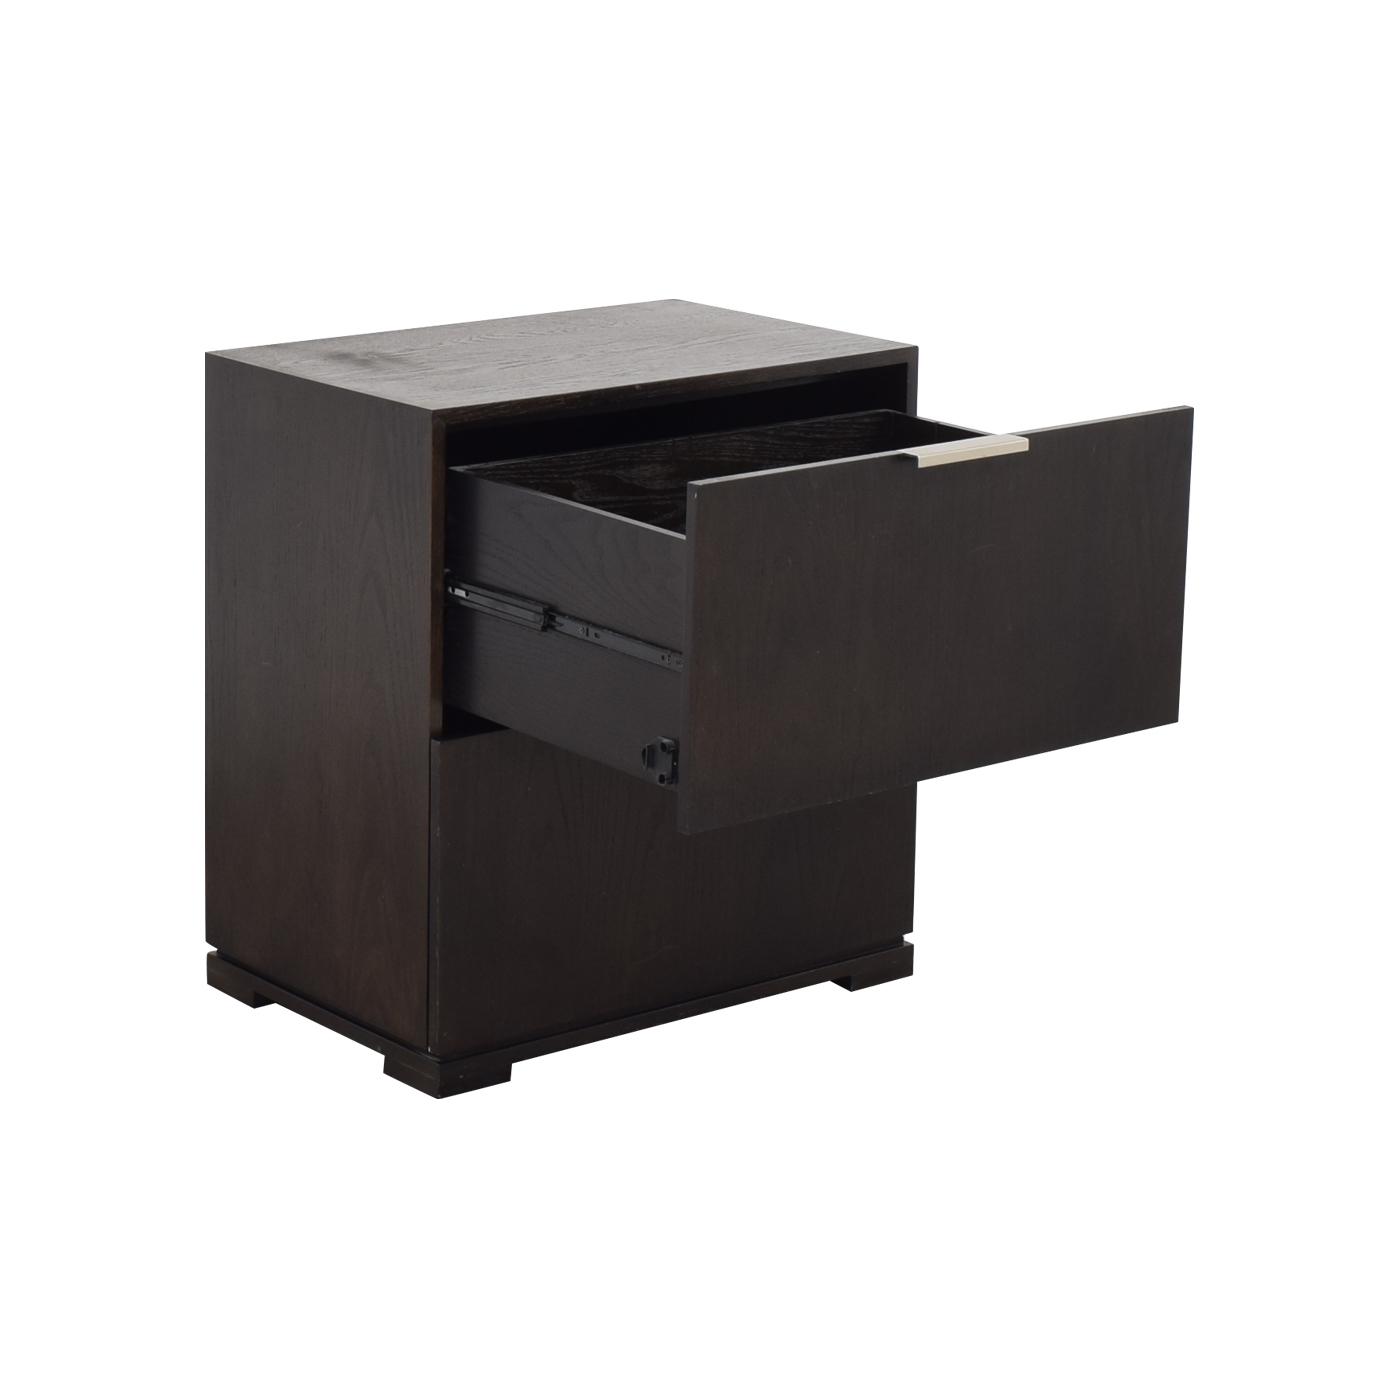 West Elm Two Drawer Dresser / Dressers